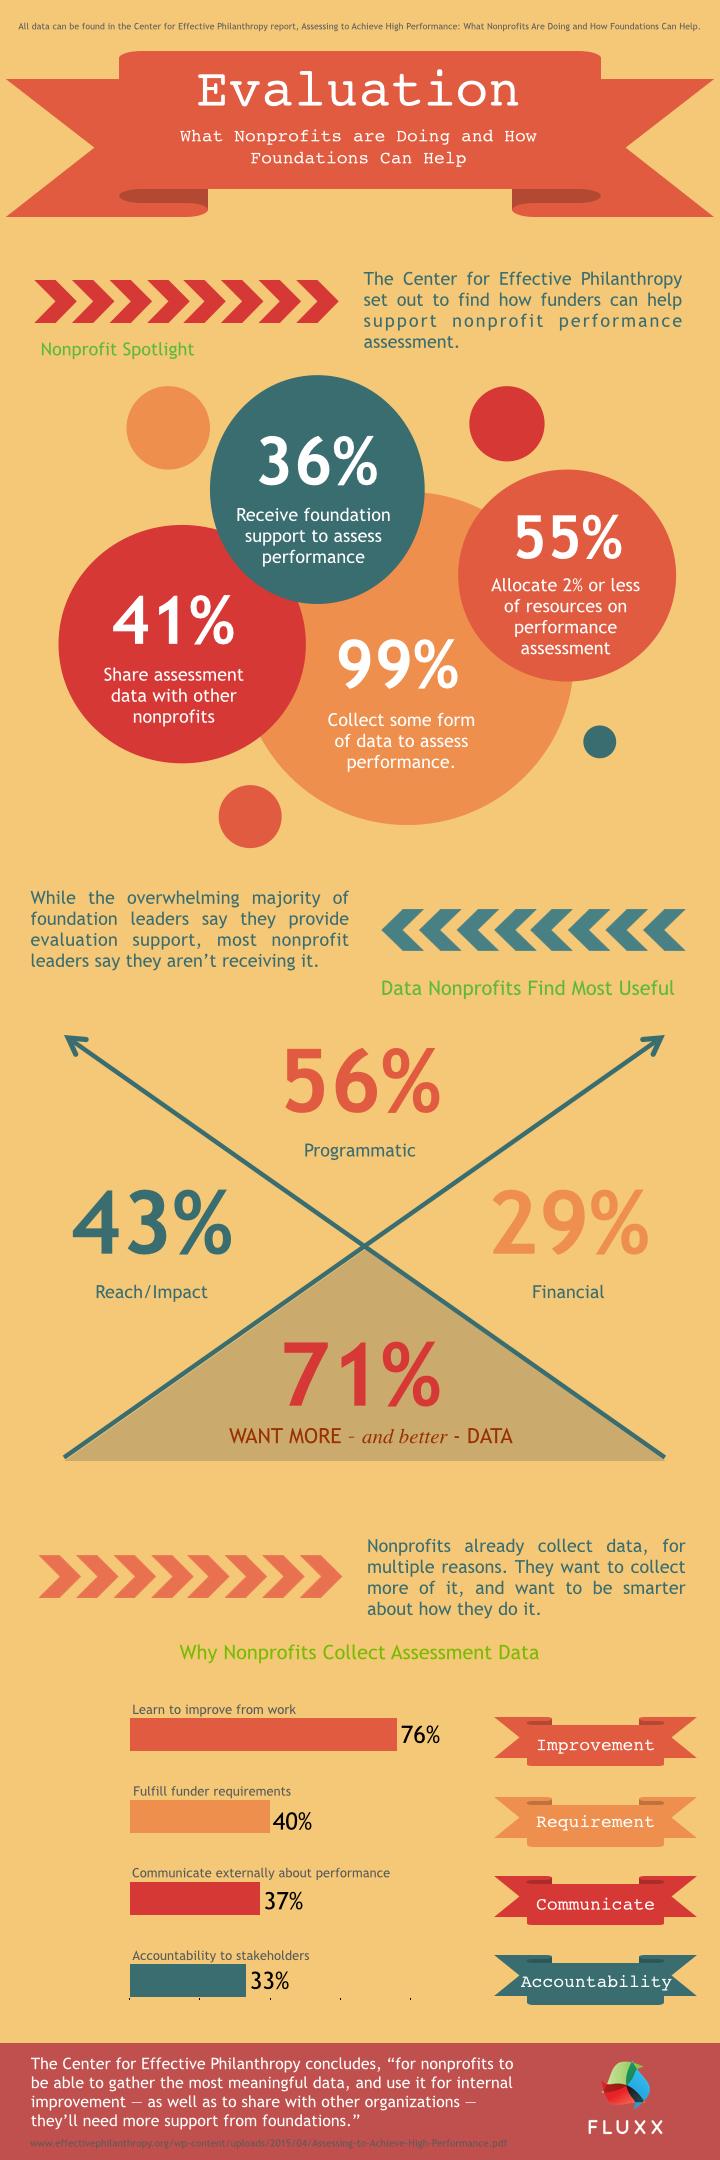 Funding Nonprofit Eval InfoGraphic.001